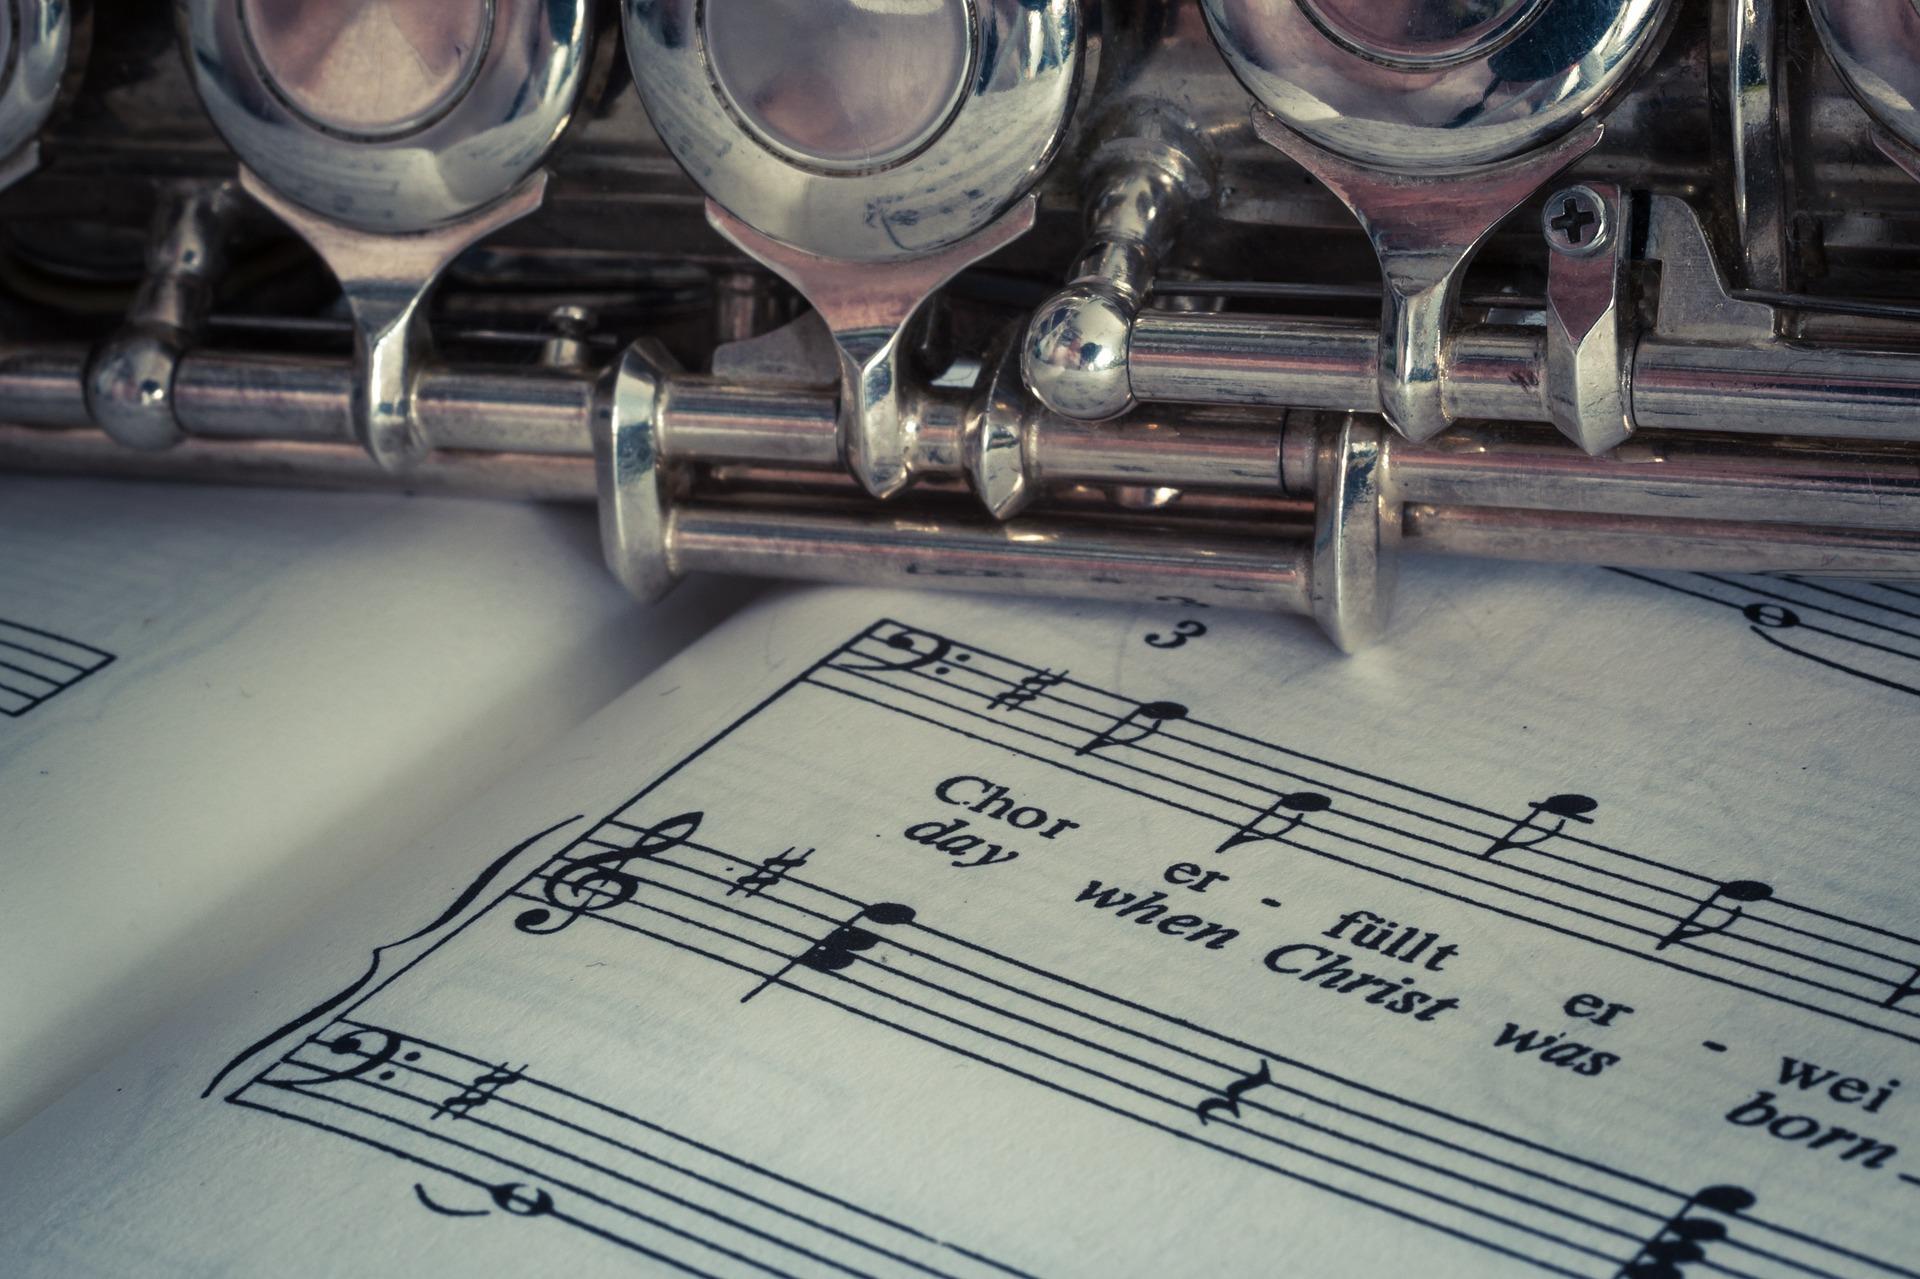 flauta, シート音楽, 楽器, スタッフ, 音符, flauta traveseフルート - HD の壁紙 - 教授-falken.com